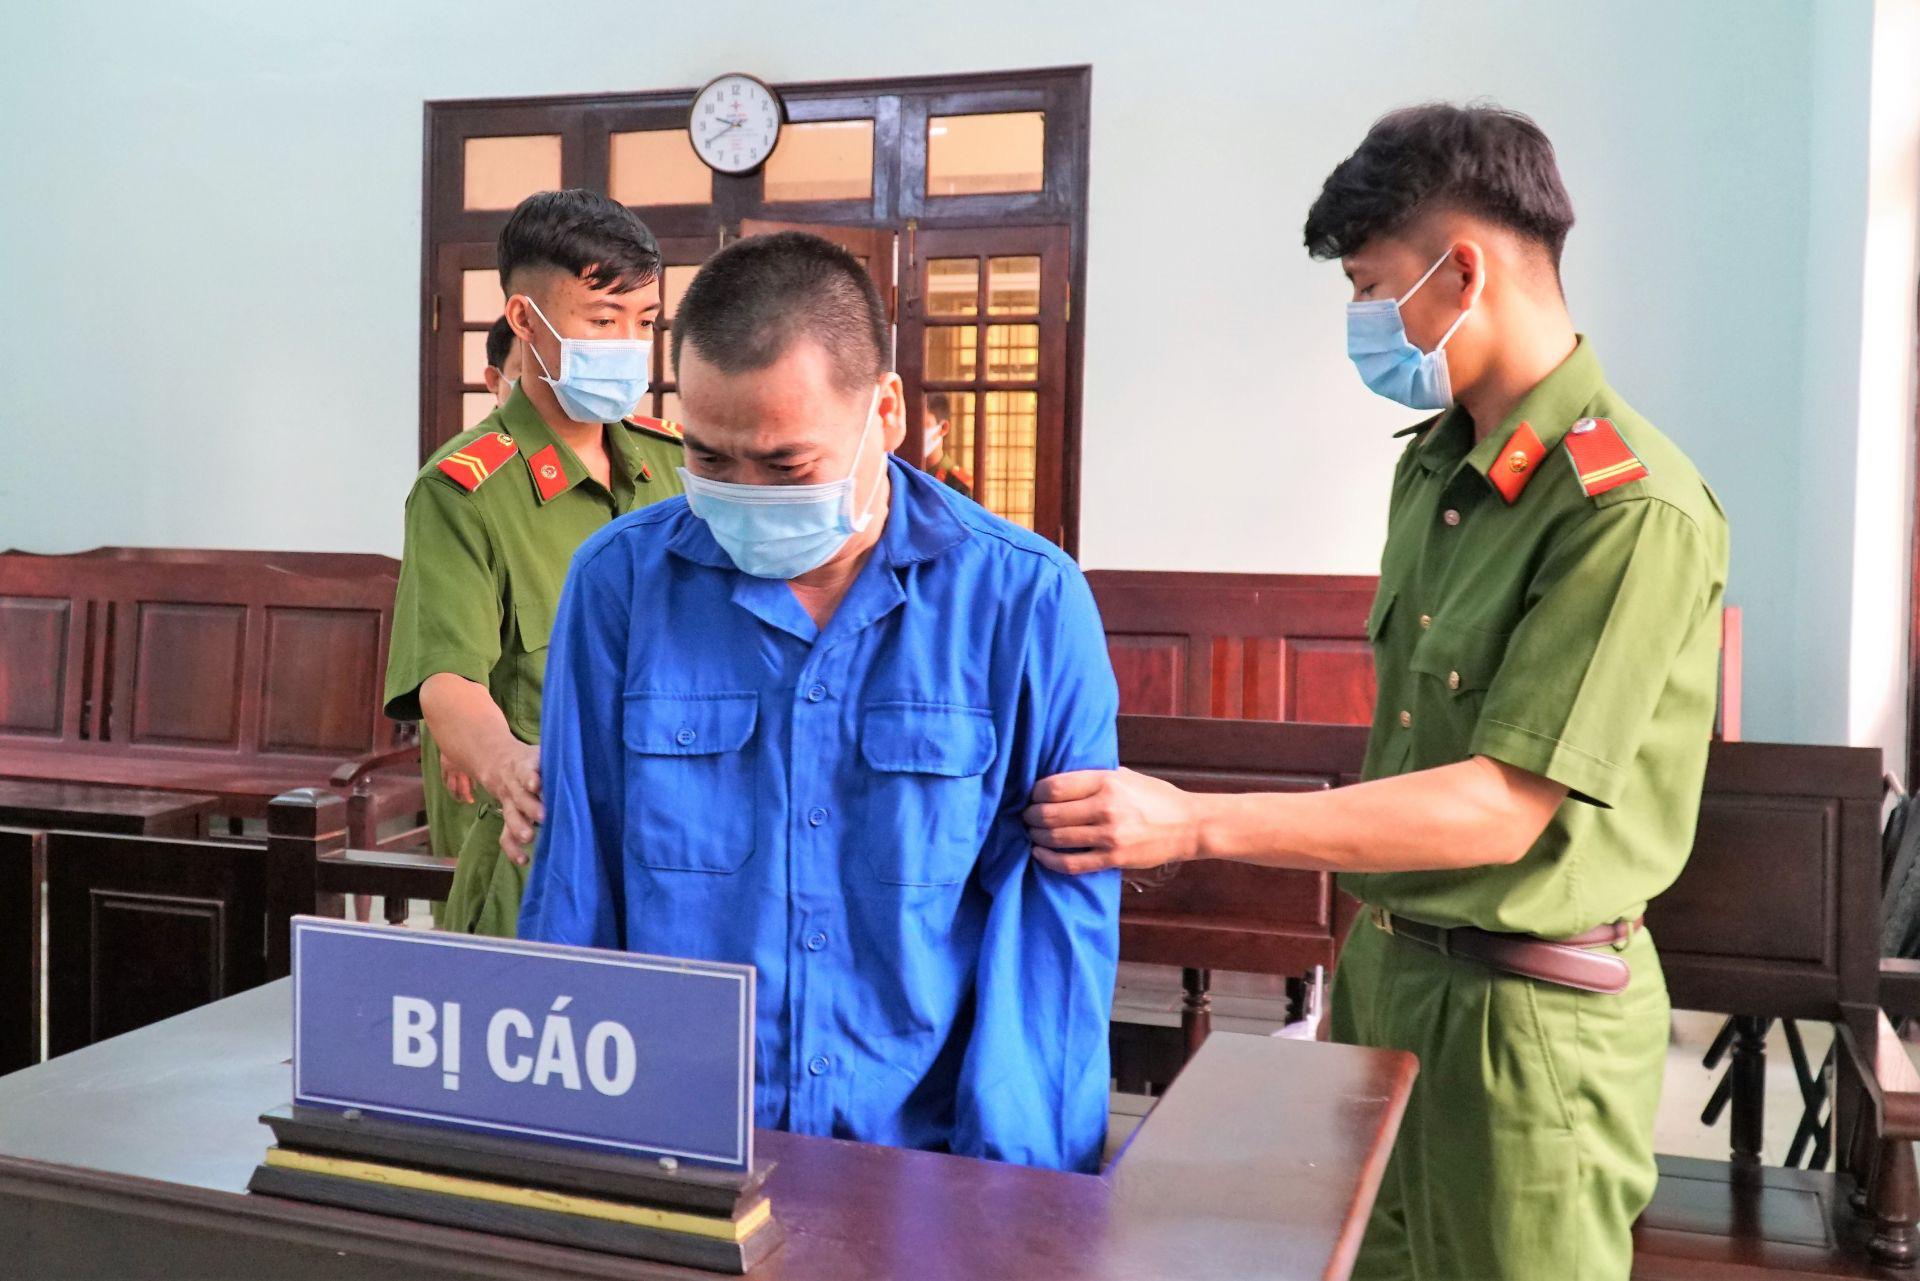 Vietnamese teacher jailed for molesting, having sex with ninth graders